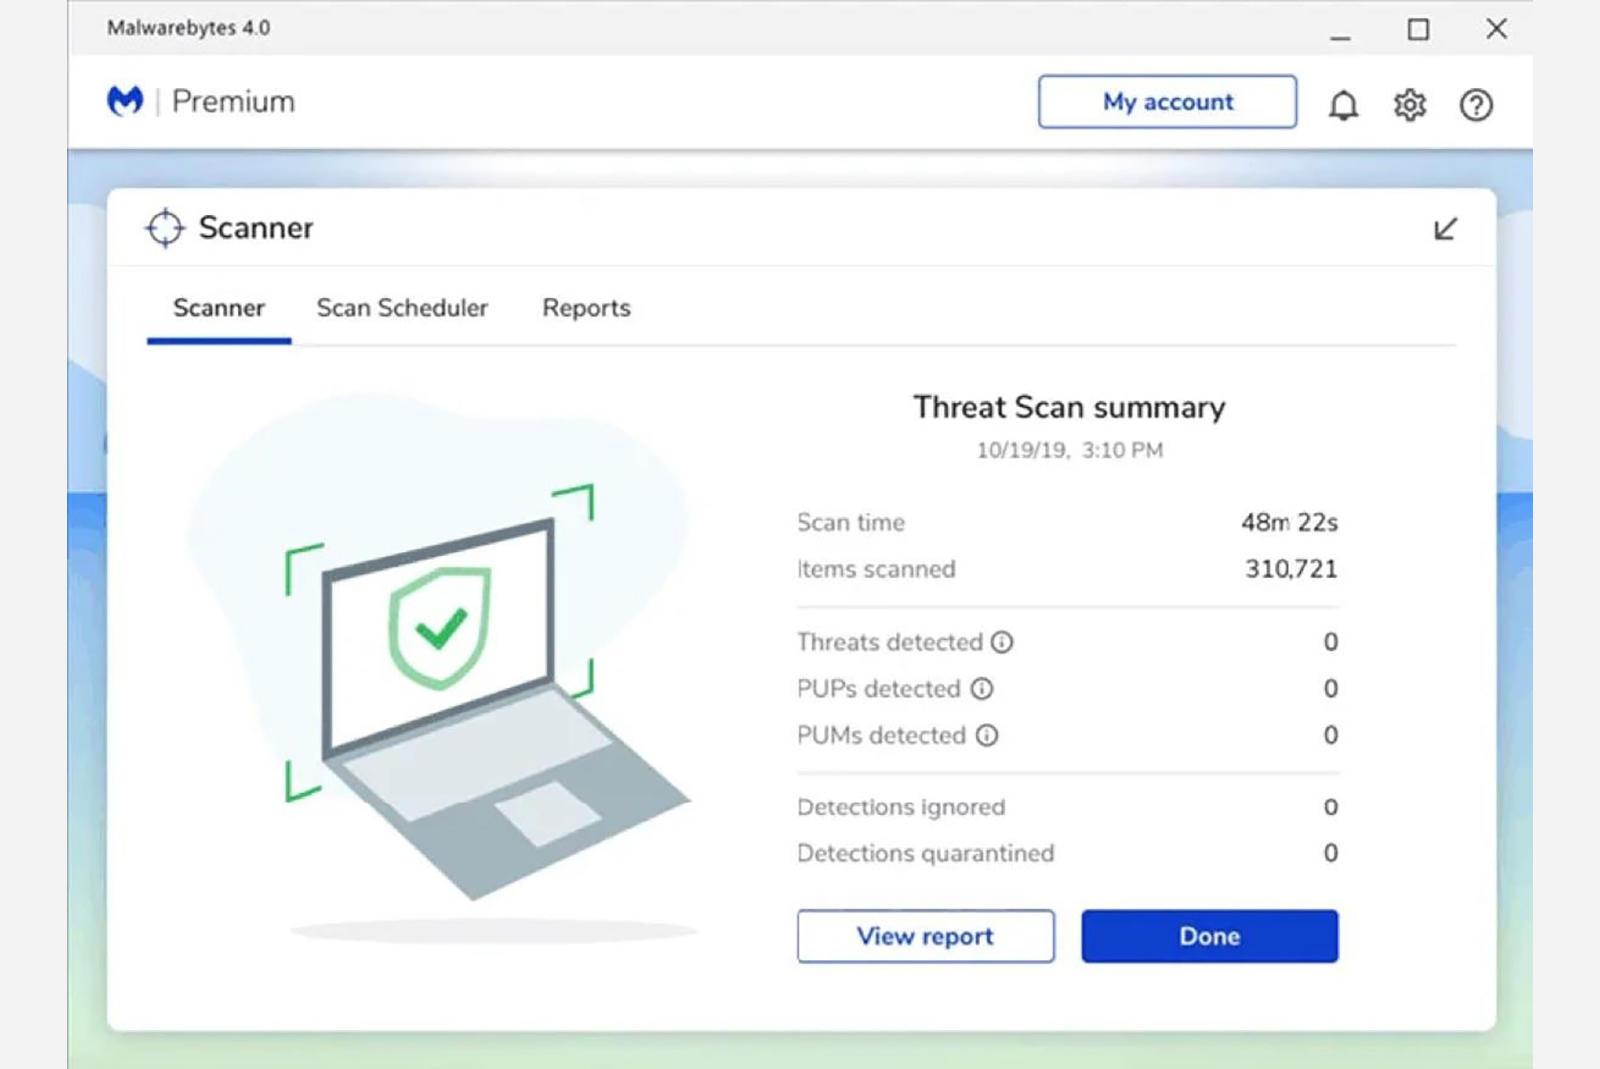 malwarebytes-best-antivirus-software-review.jpg